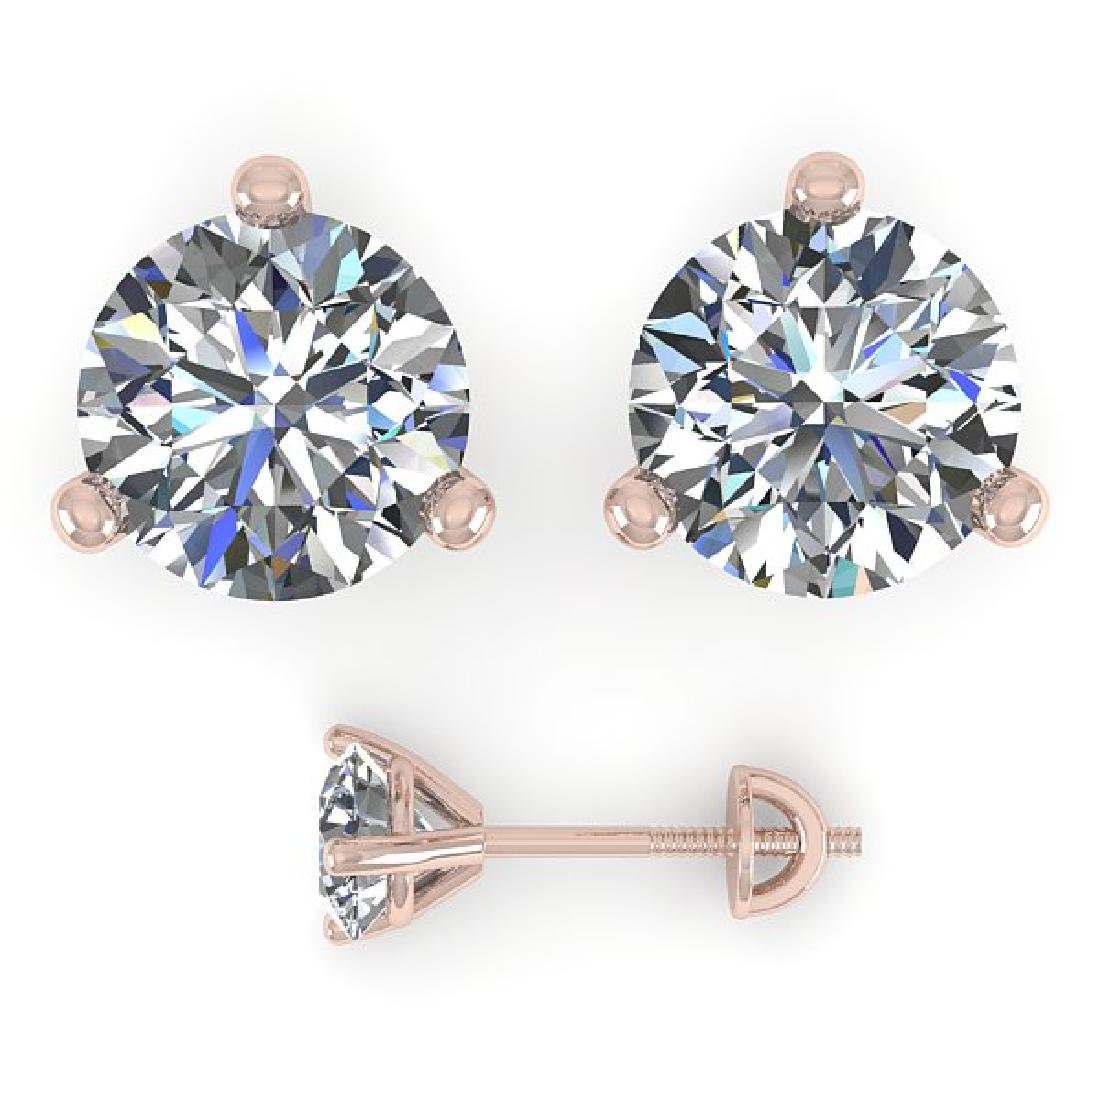 1.53 CTW Certified VS/SI Diamond Stud Earrings Martini - 2